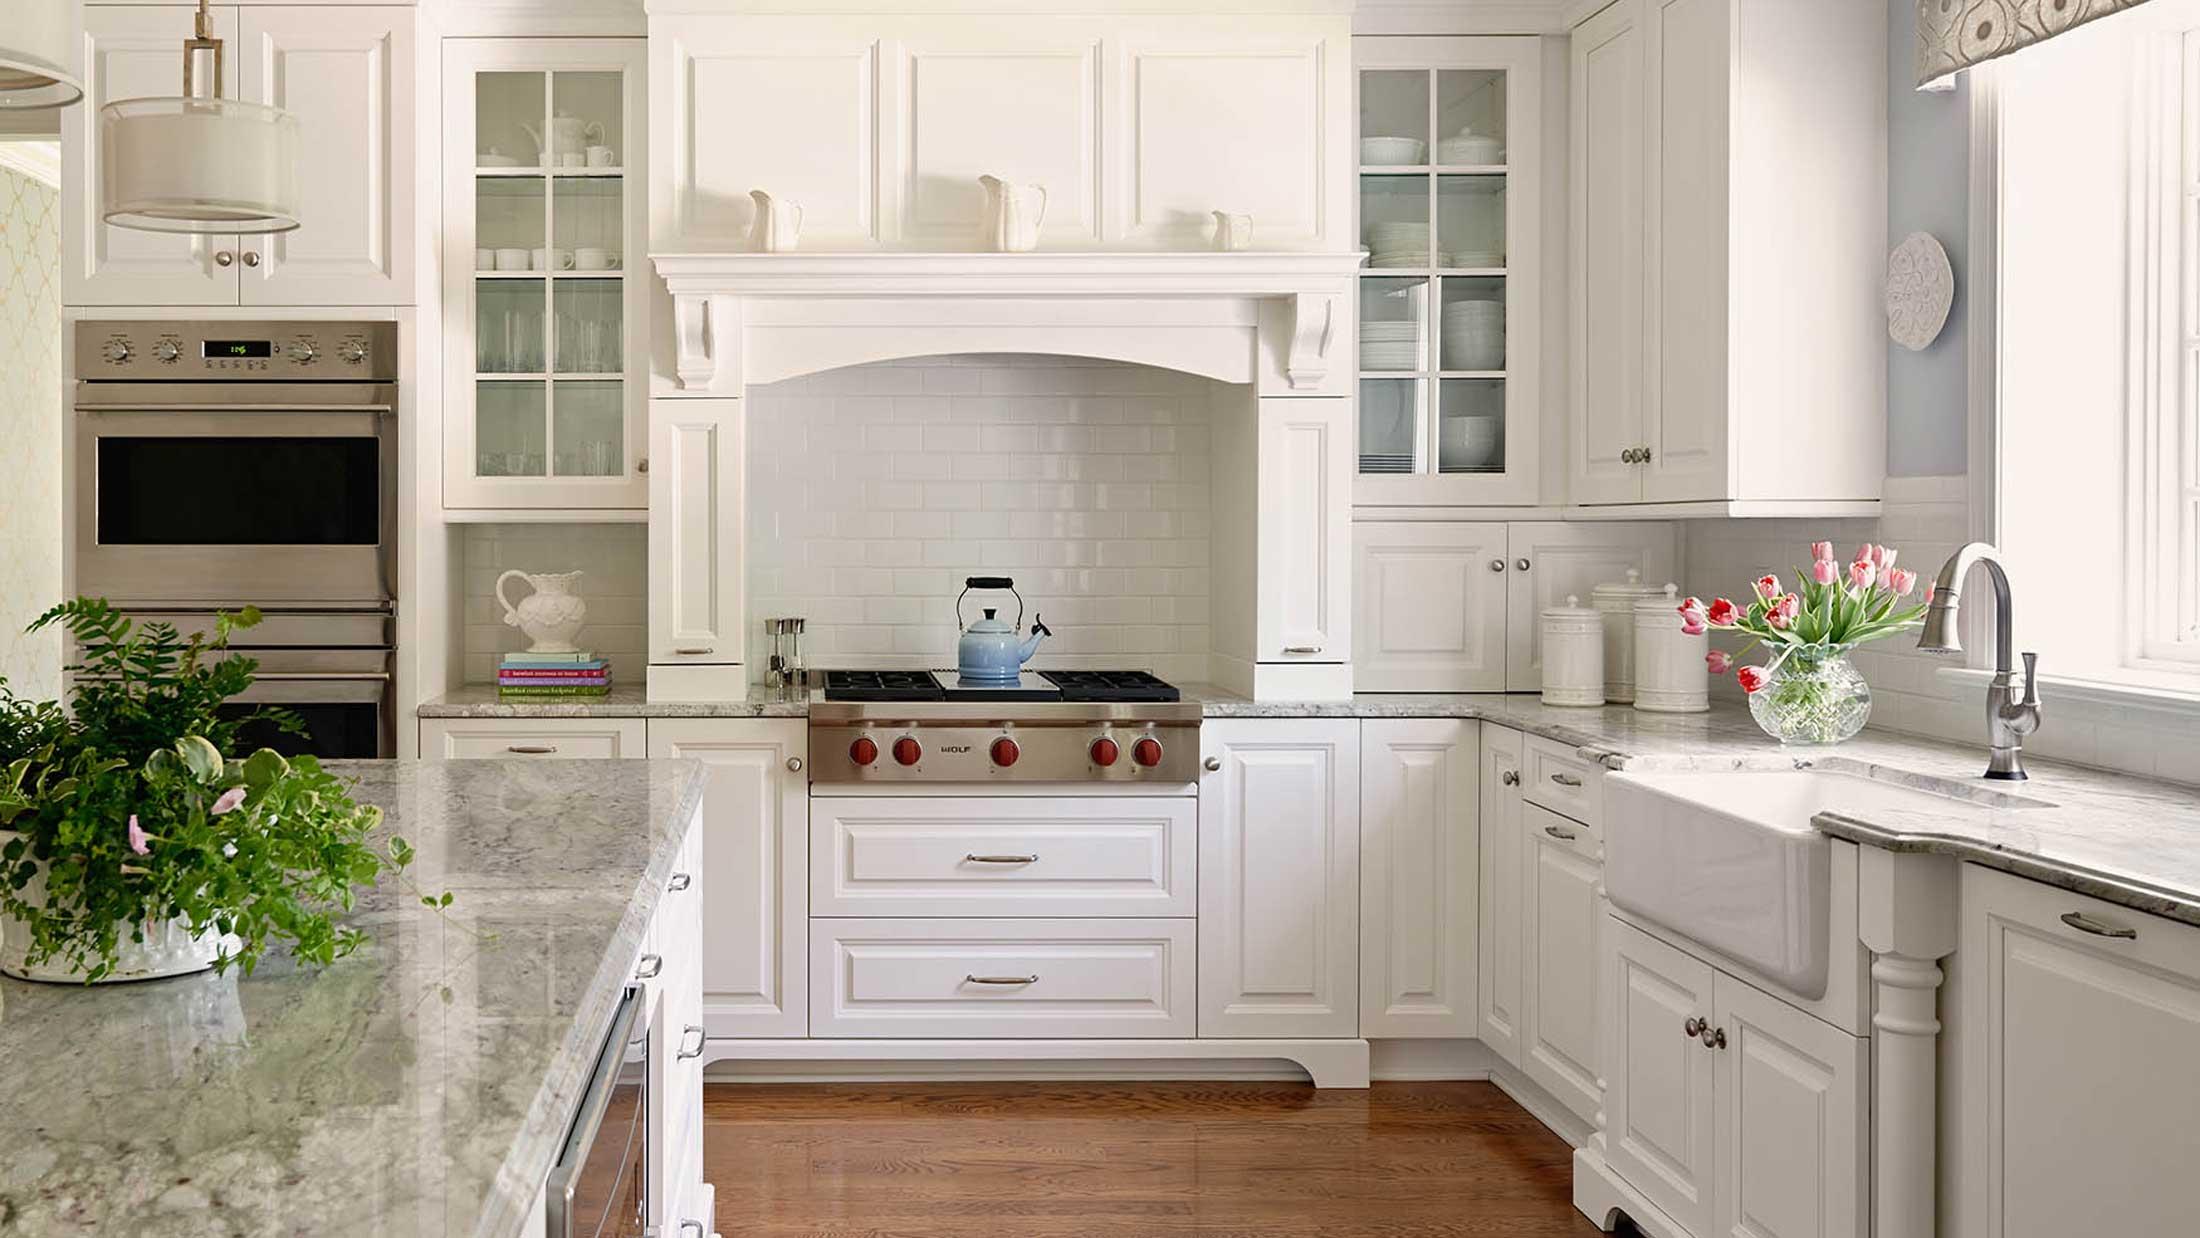 project nc mbid design greensboro nook portfolio cheerful international designers interior breakfast gallery